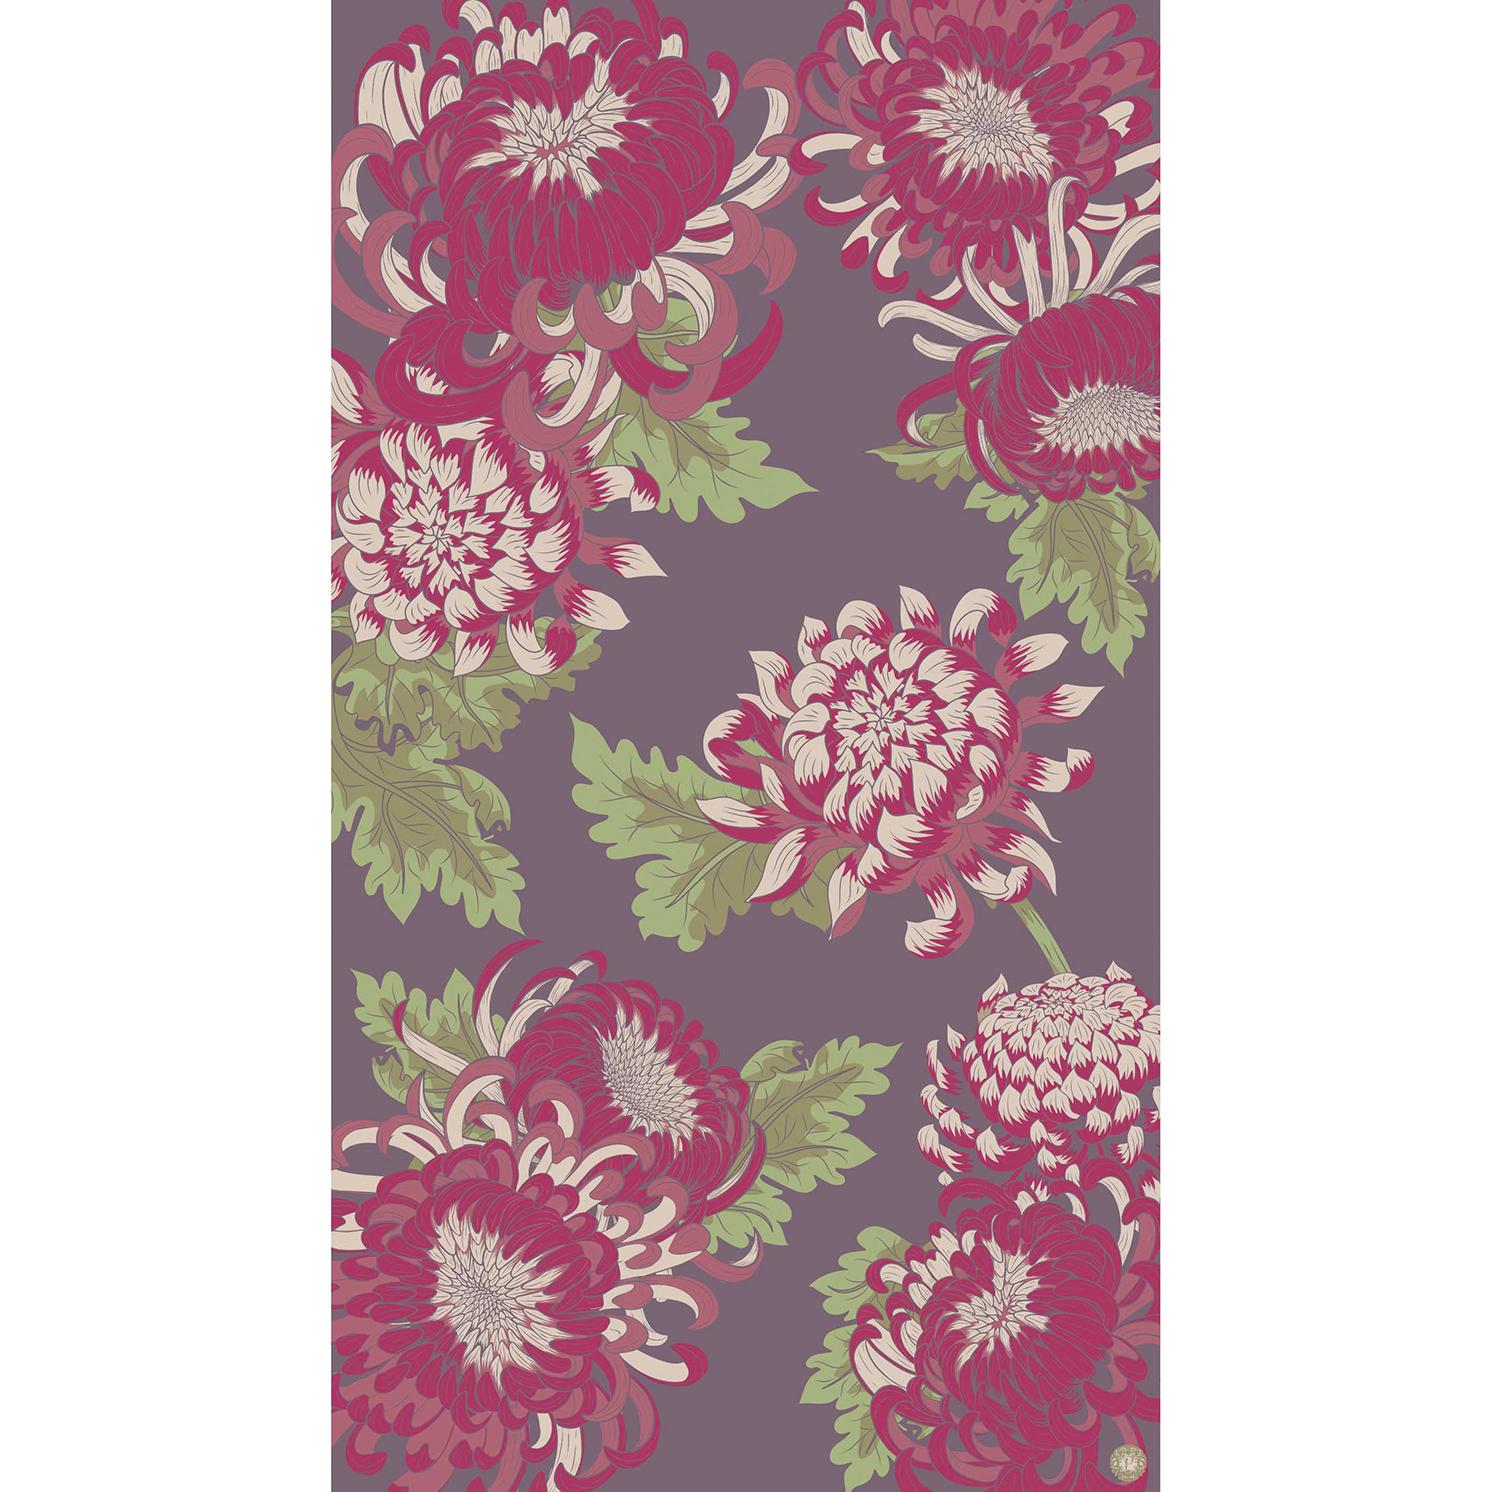 Powder – Damson Chrysanthemum Print Scarf with Powder Presentation Gift Bag